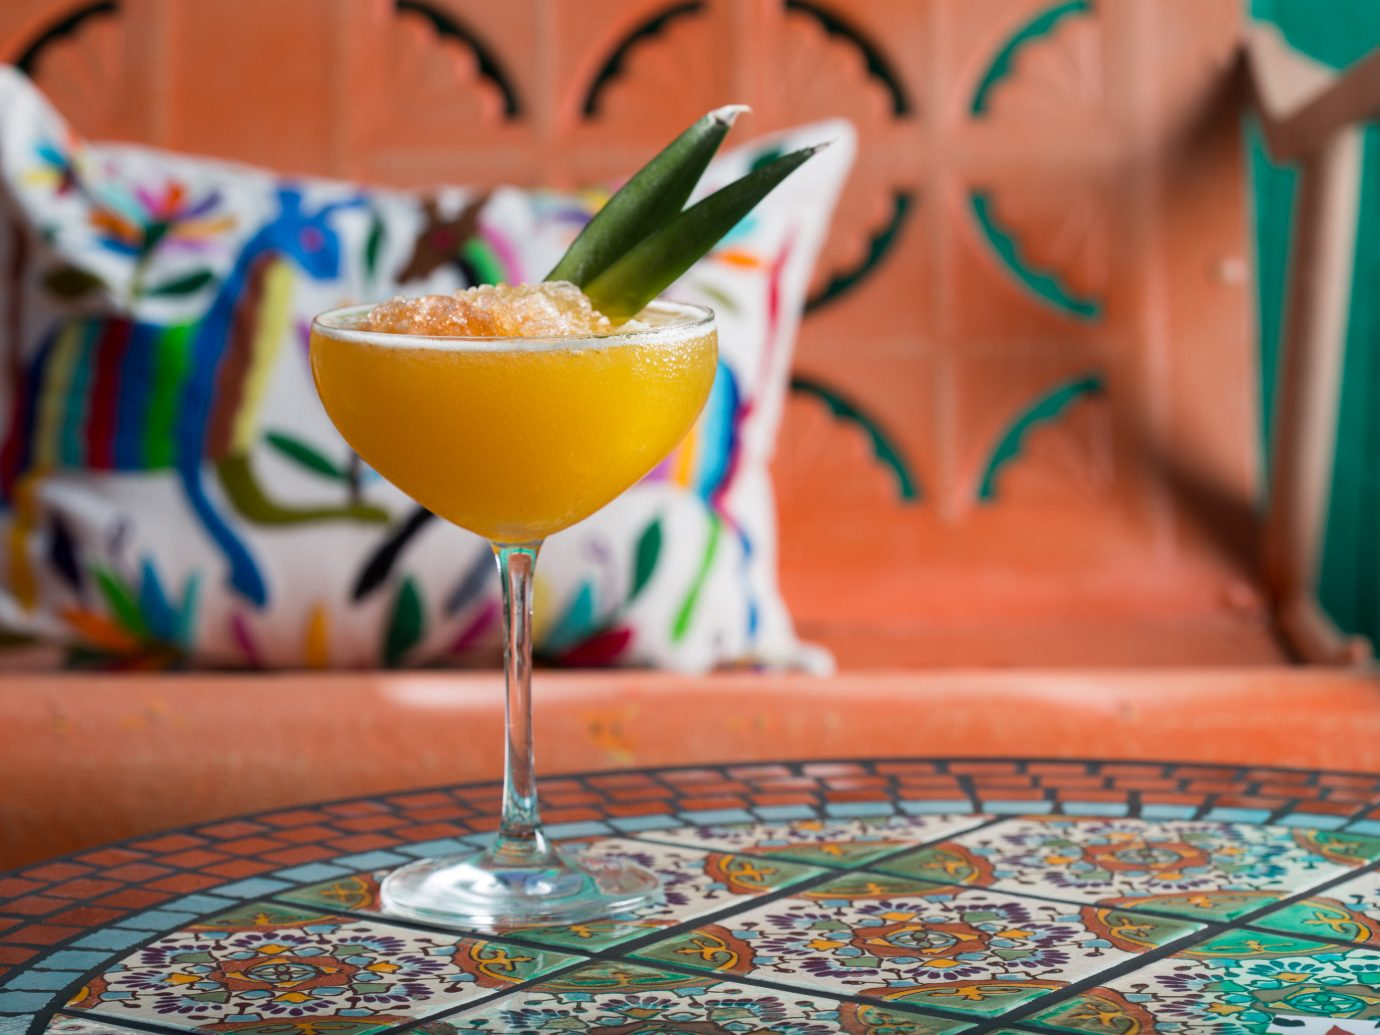 Offbeat Drink cocktail non alcoholic beverage cocktail garnish margarita beverage